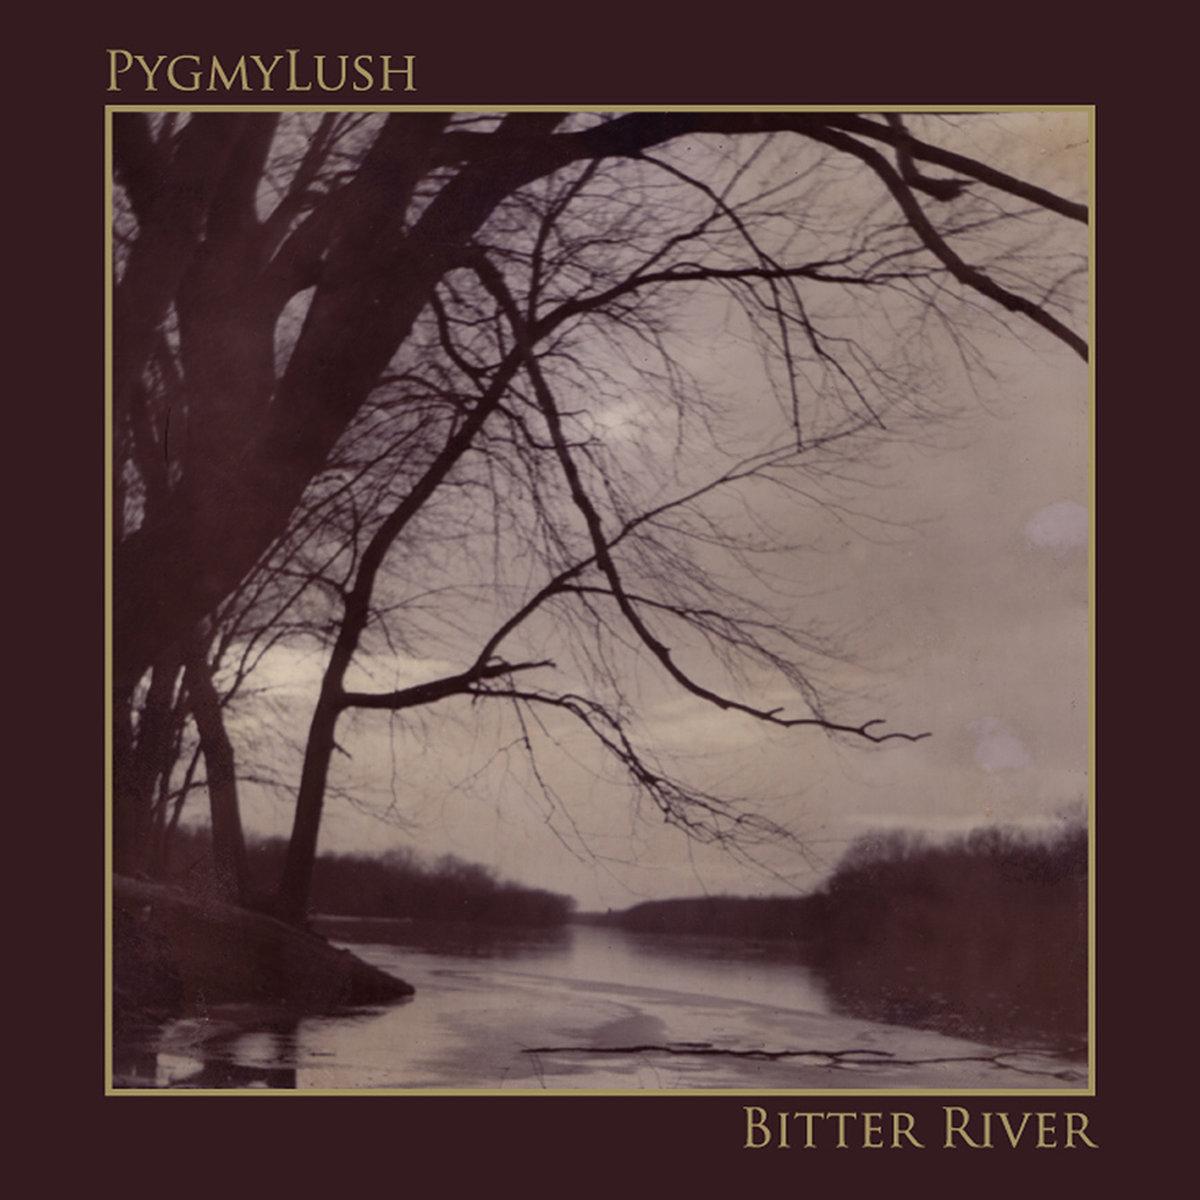 PYGMY LUSH Bitter River - Vinyl LP (black)